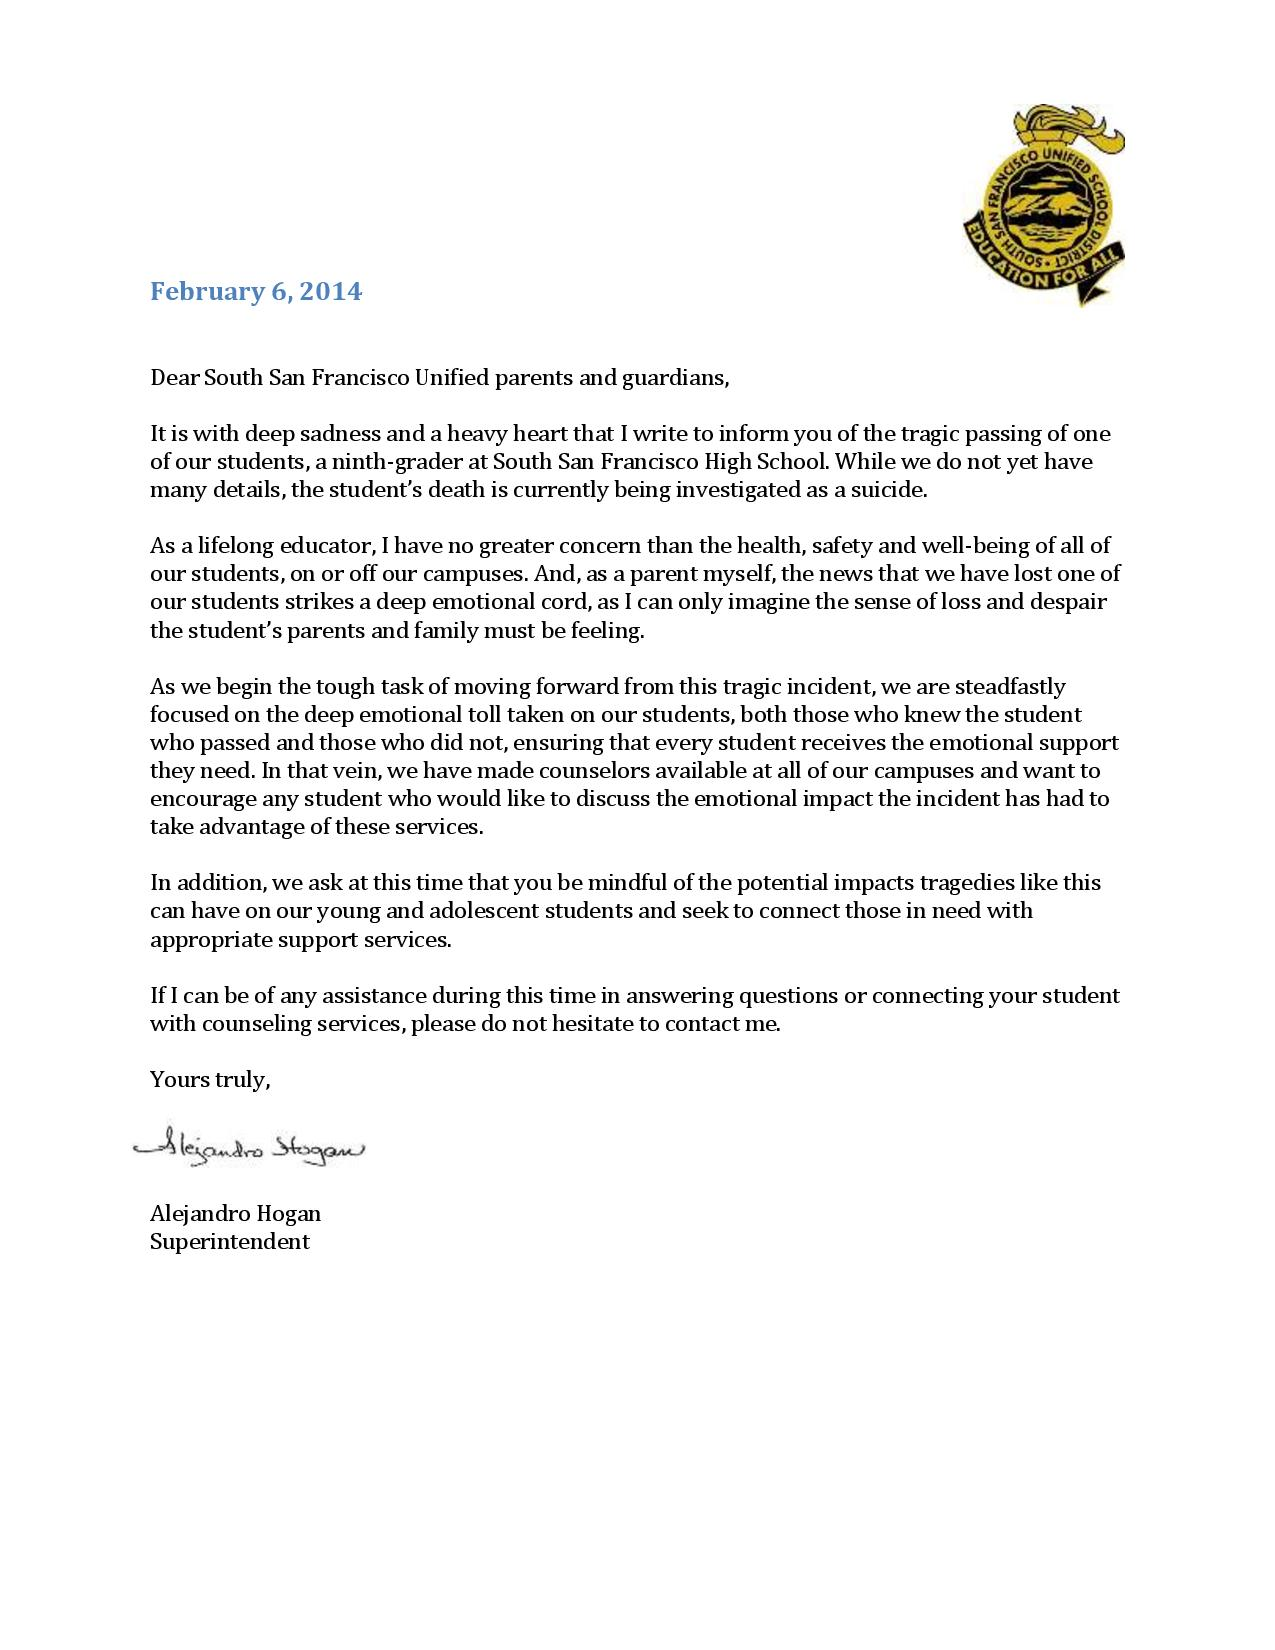 A message from SSFUSD Superintendent Hogan